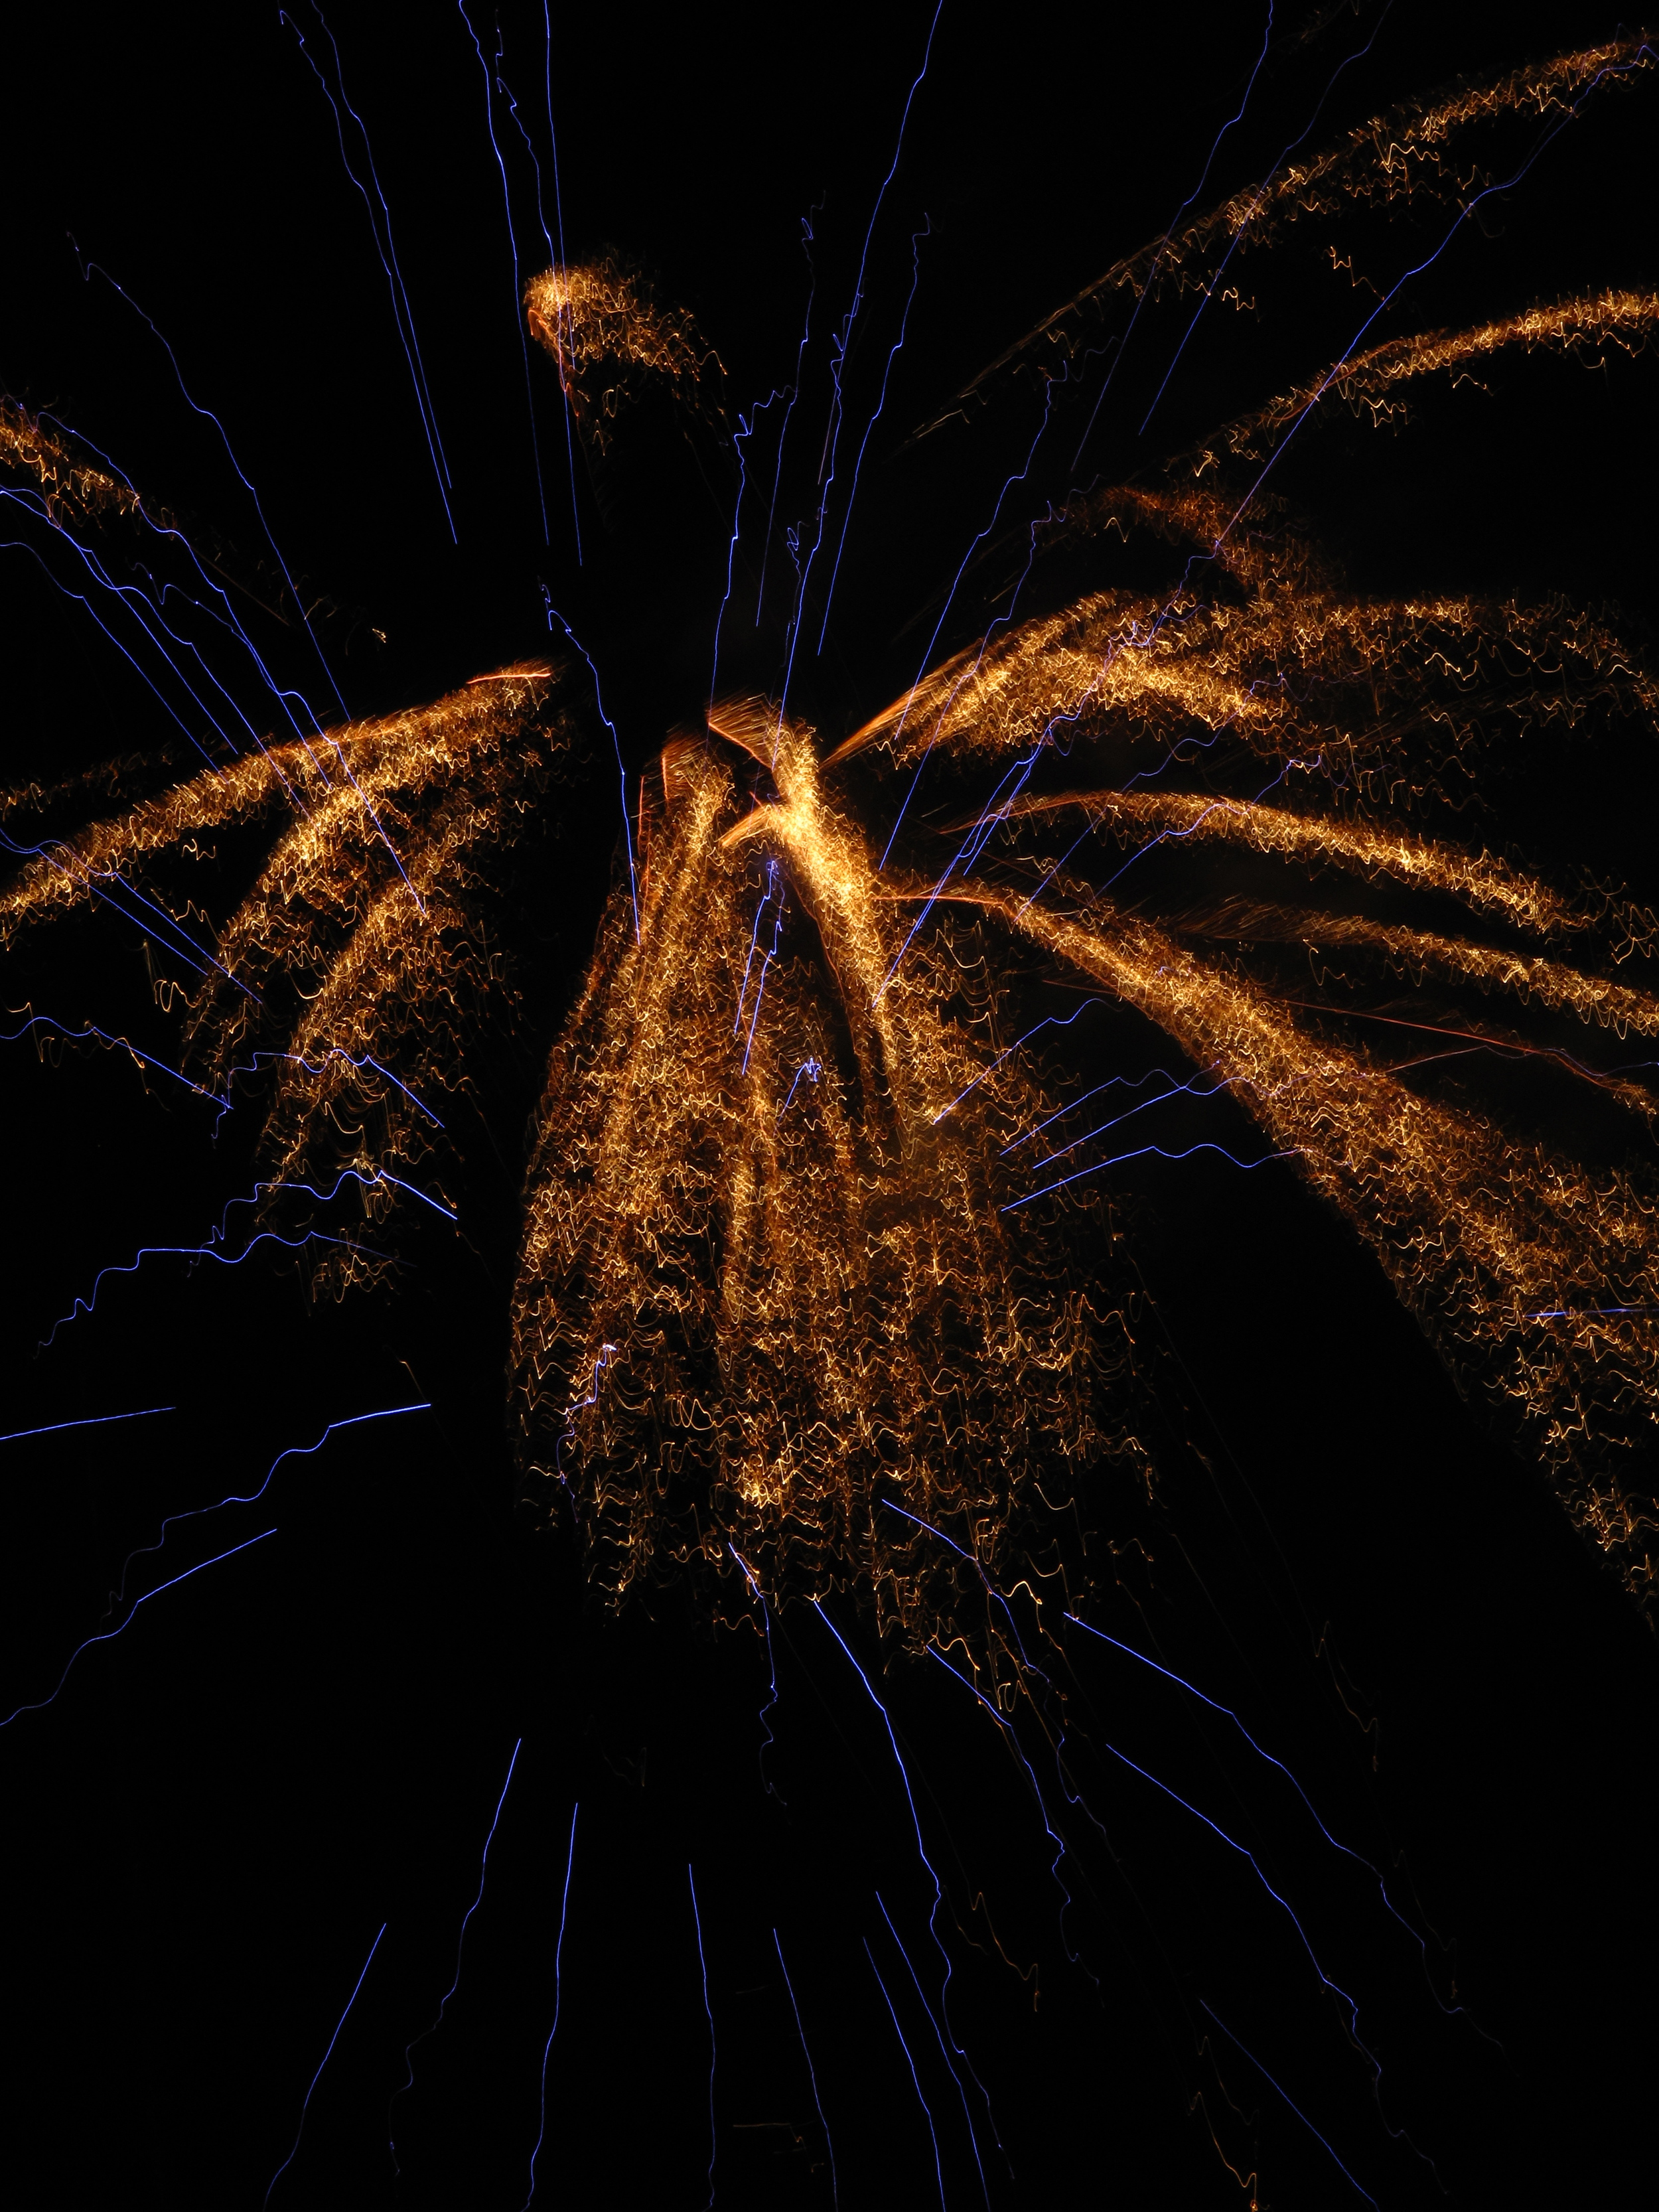 Blue and gold fireworks burst, Les Eyzies de Tayac, France.